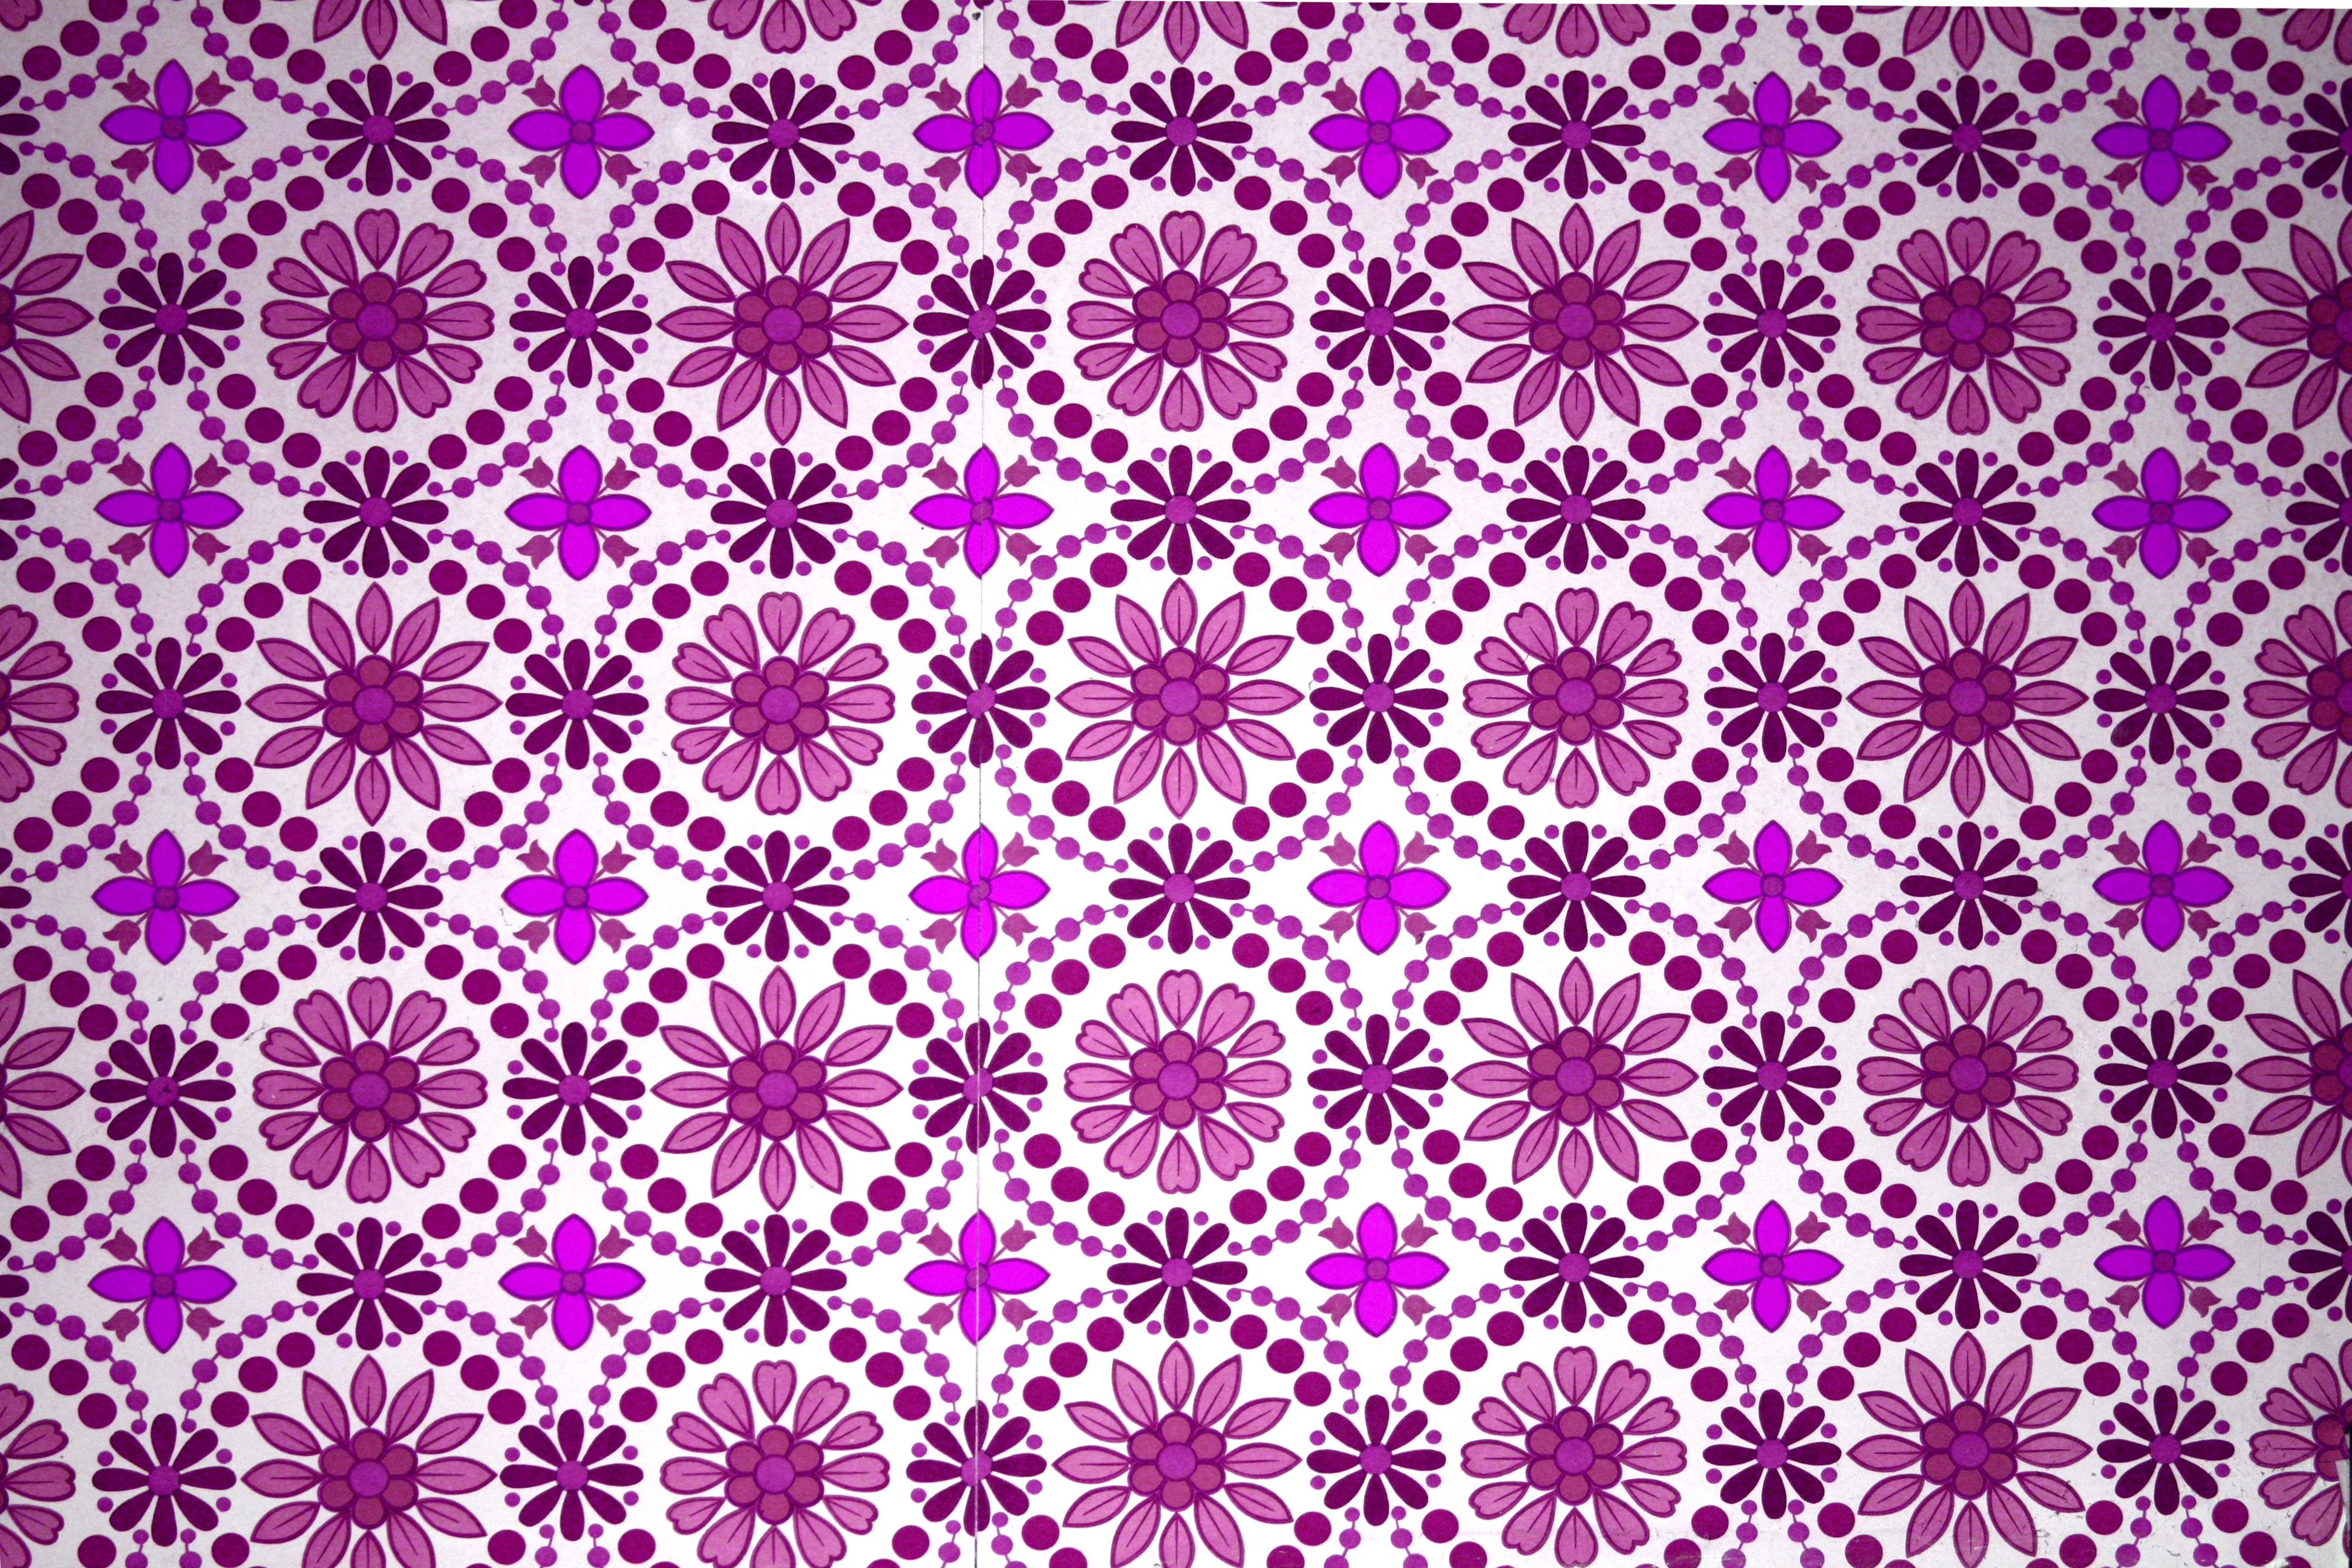 Magenta Flowers Wallpaper Texture Picture Photograph 3888x2592